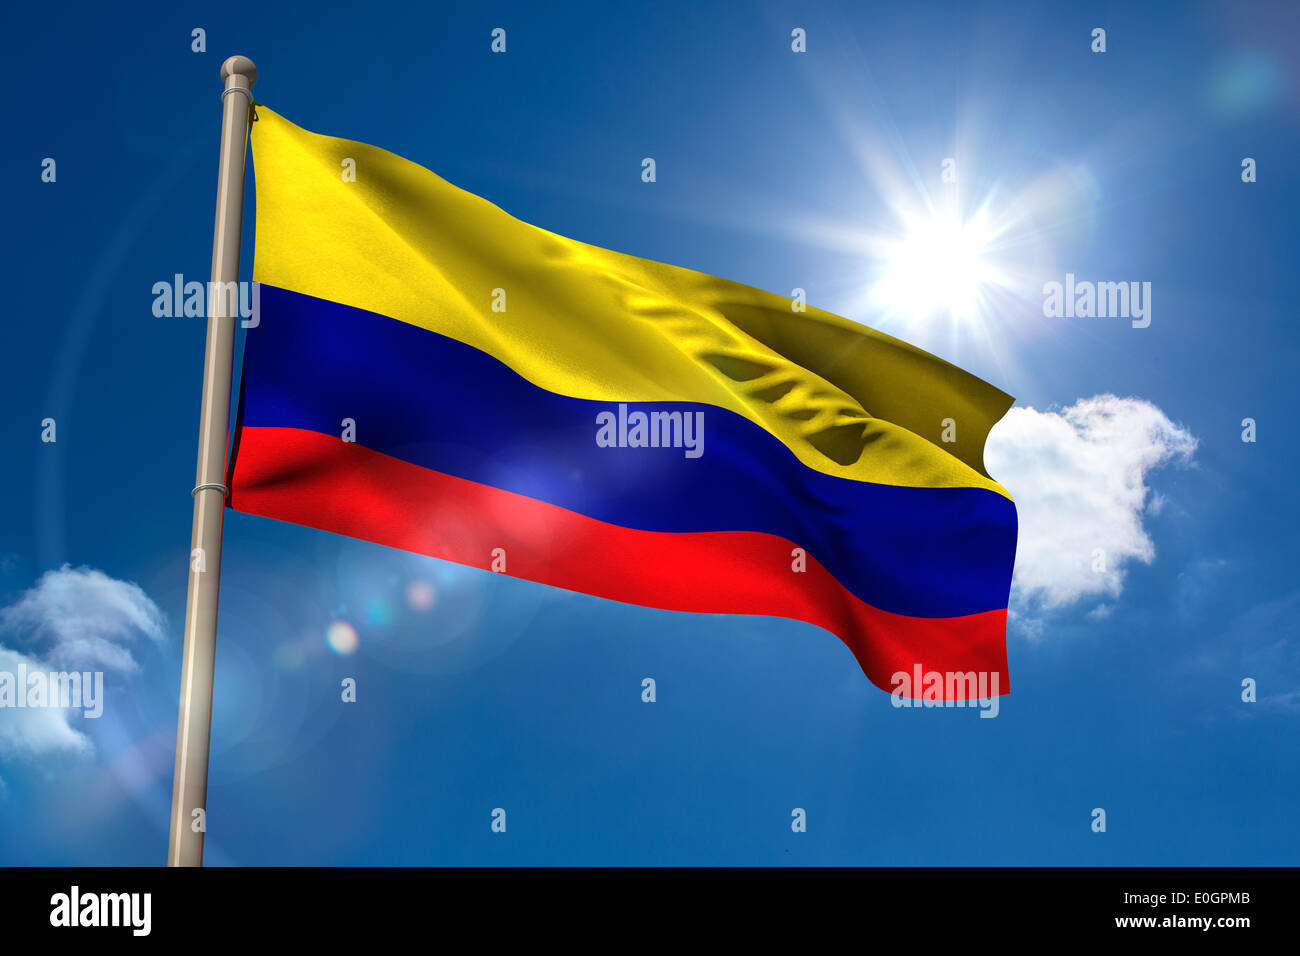 Colombia national flag on flagpole - Stock Image